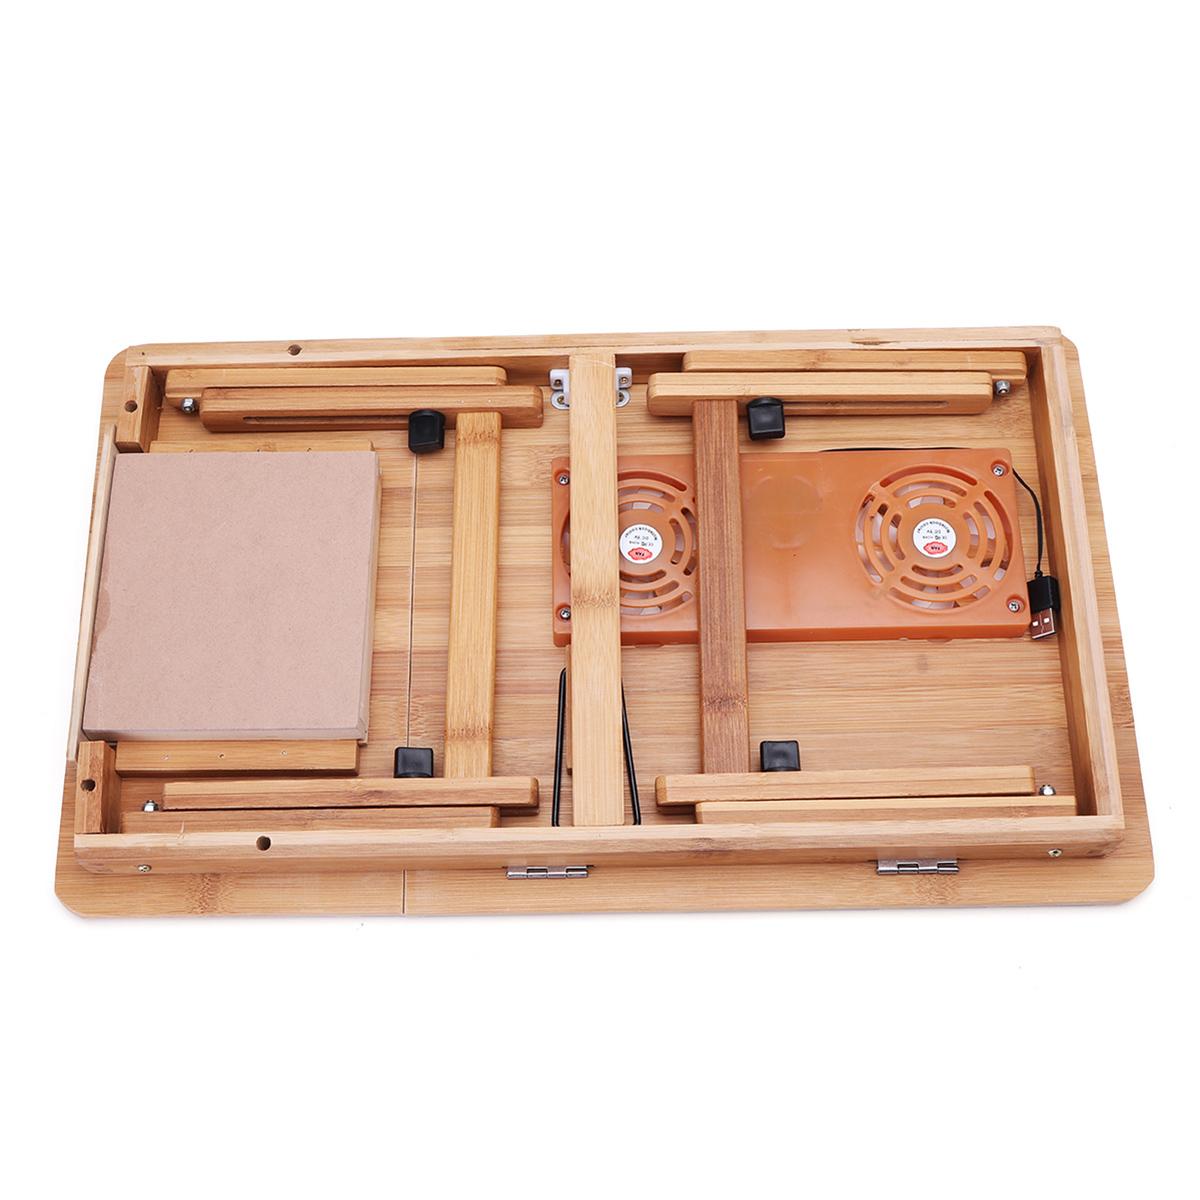 Portable Folding Lap Desk Bamboo Laptop Breakfast Tray Bed Table Stand Fan Alexnld Com